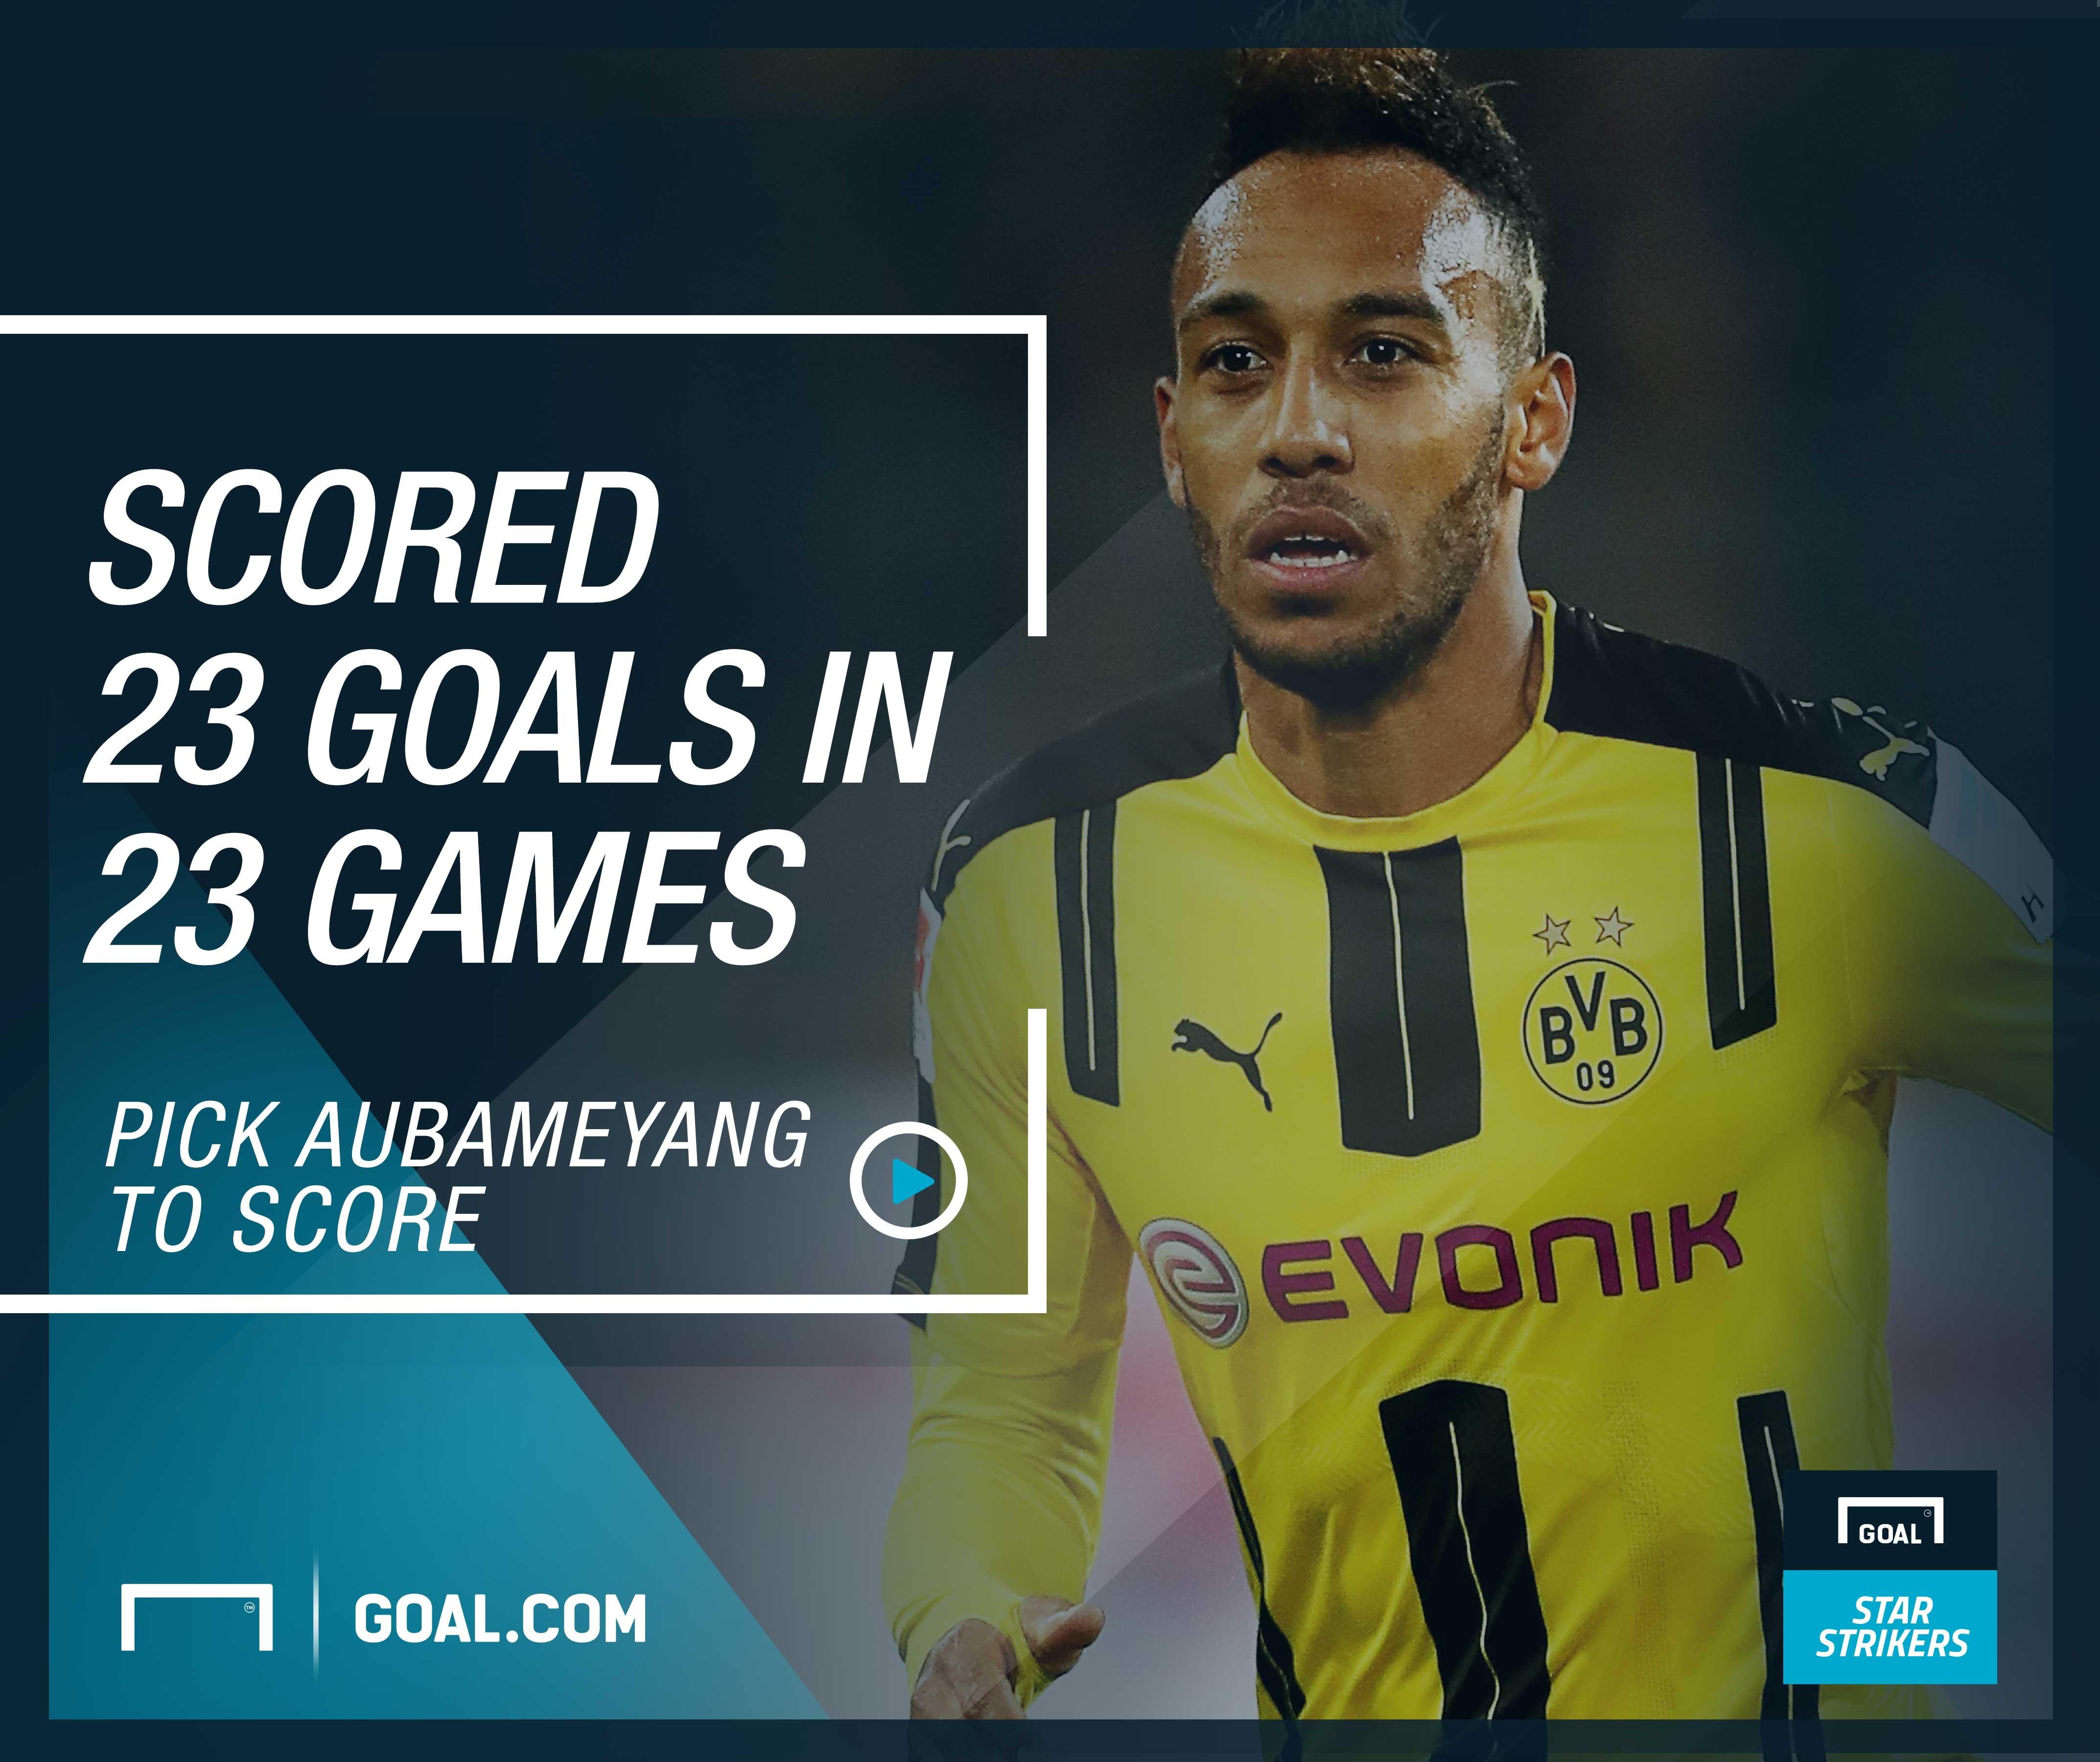 Goal Star Strikers Aubameyang